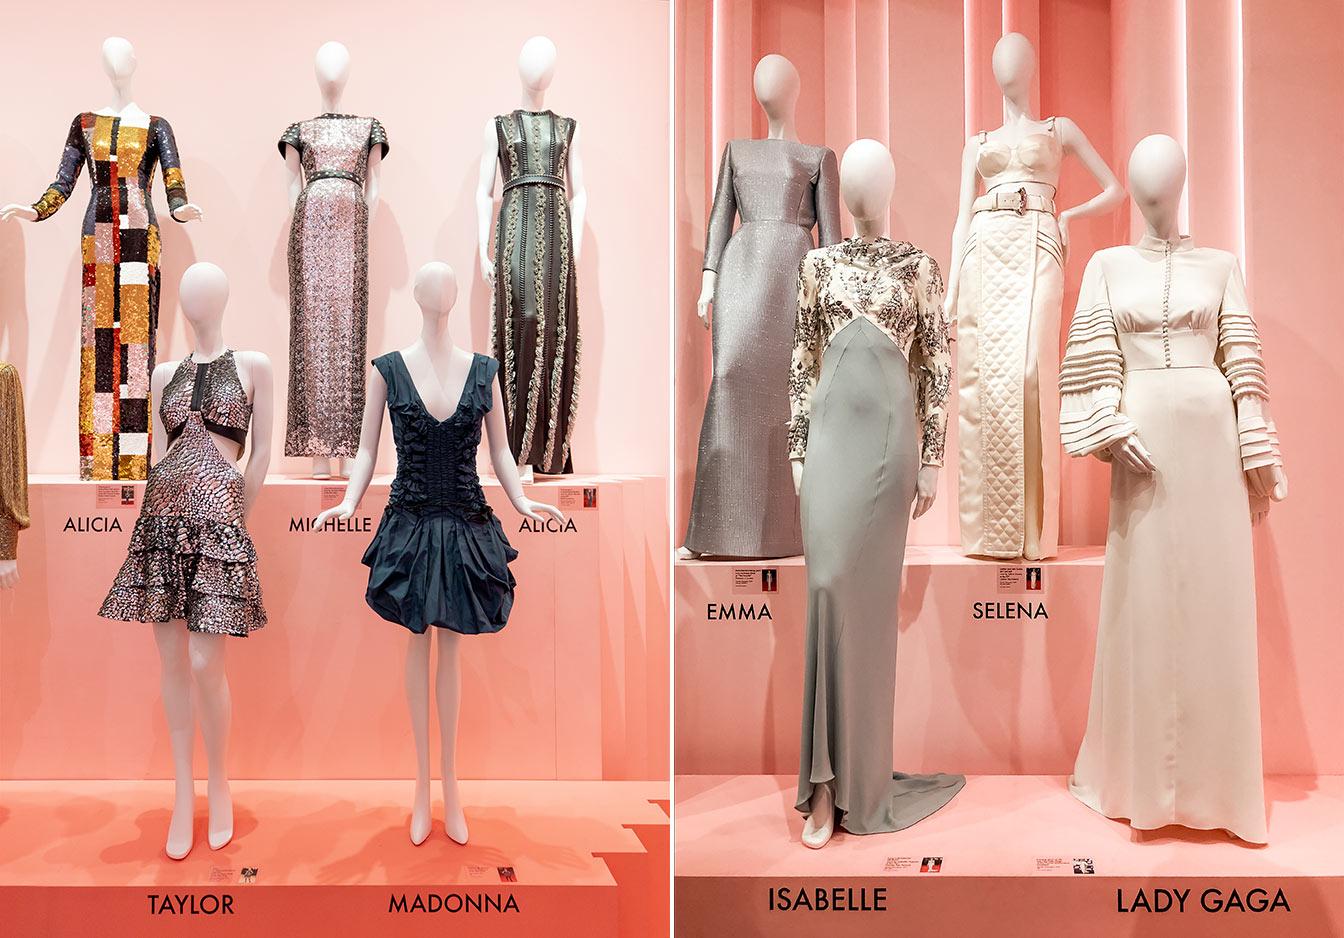 Louis Vuitton Taylor Swift Dress